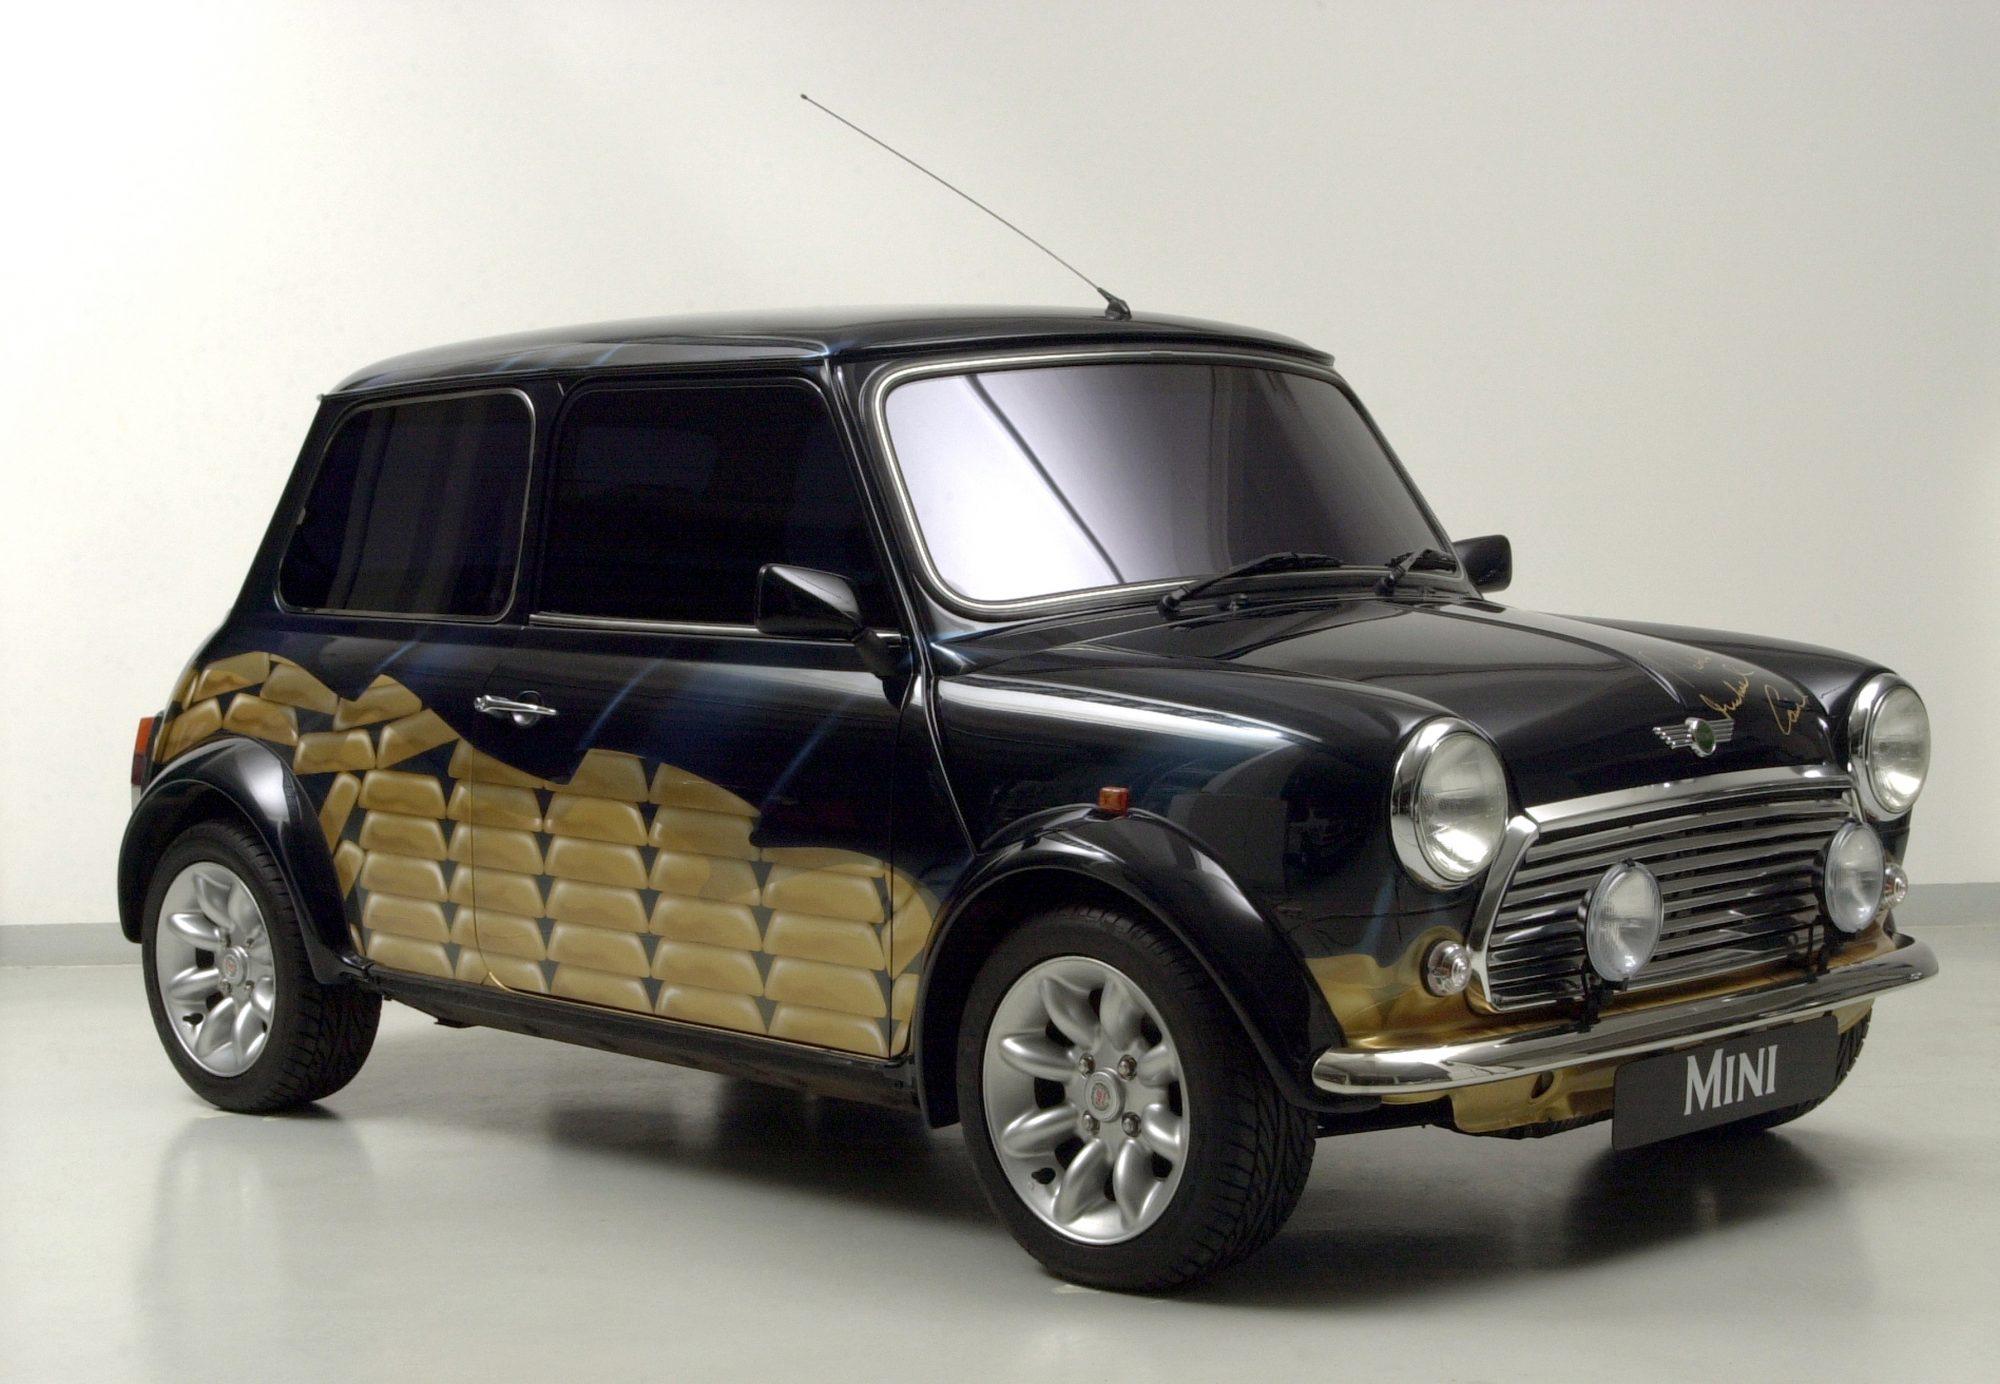 Mini, Austin Mini, Rover Mini, Classic Mini, Mini Buying guide, Mini modified